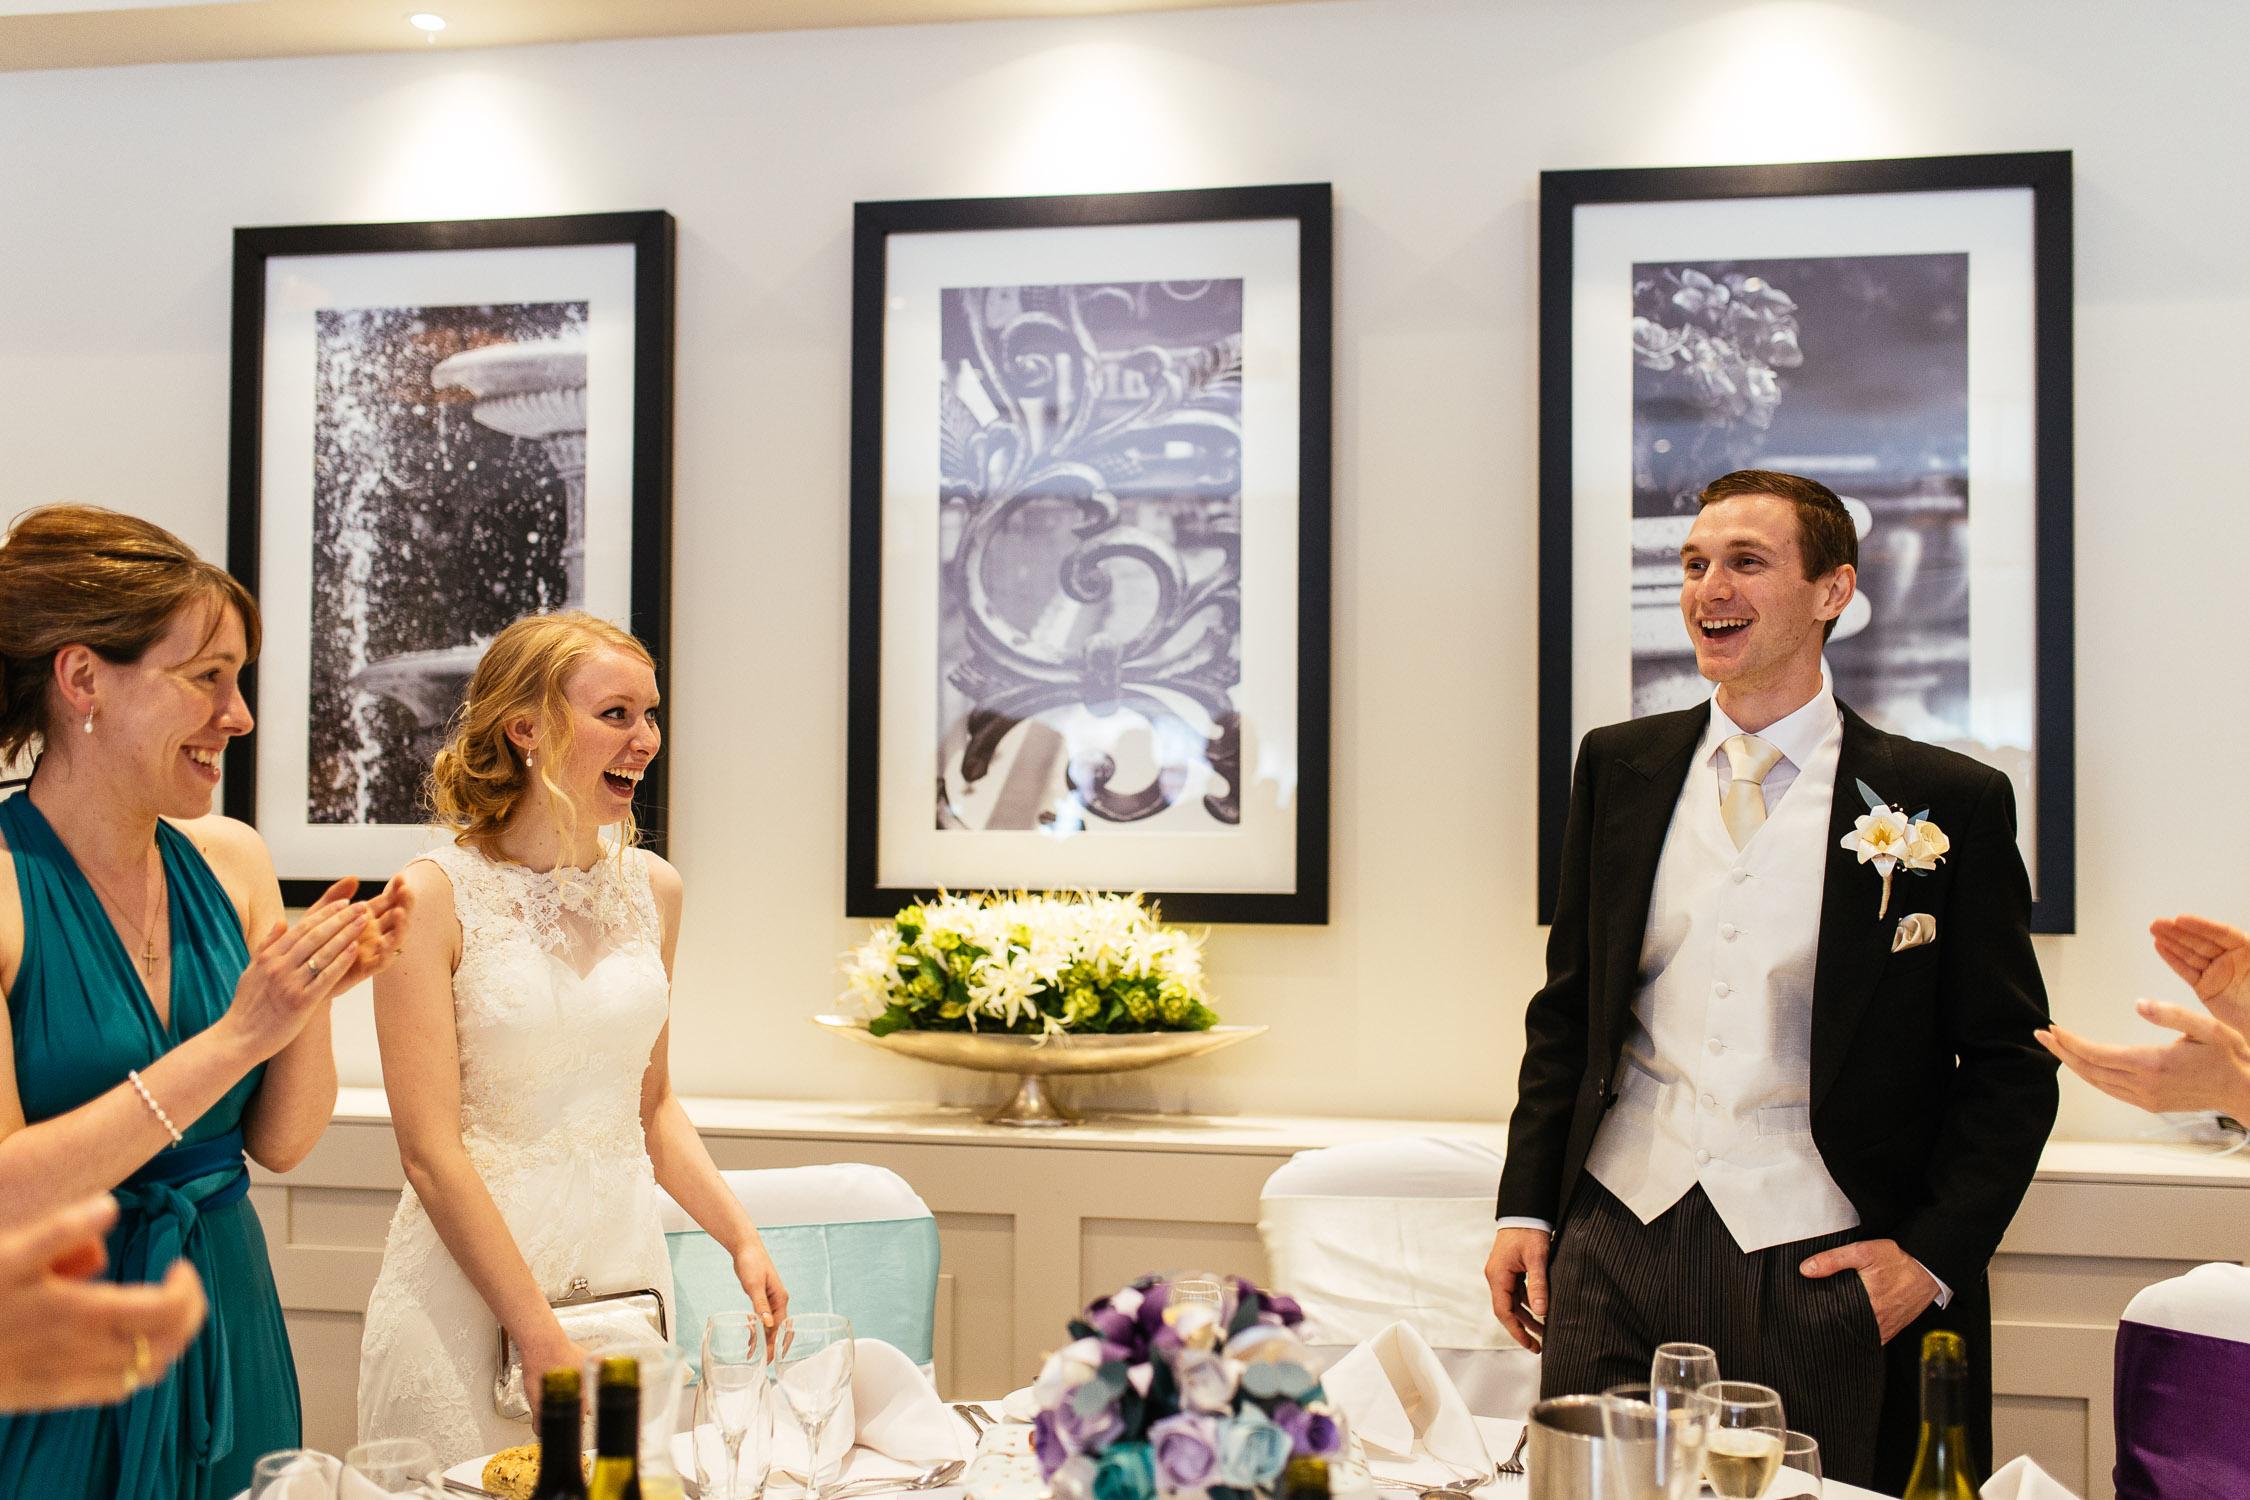 Lizi-and-Mark-Wedding-Highlights-73.jpg